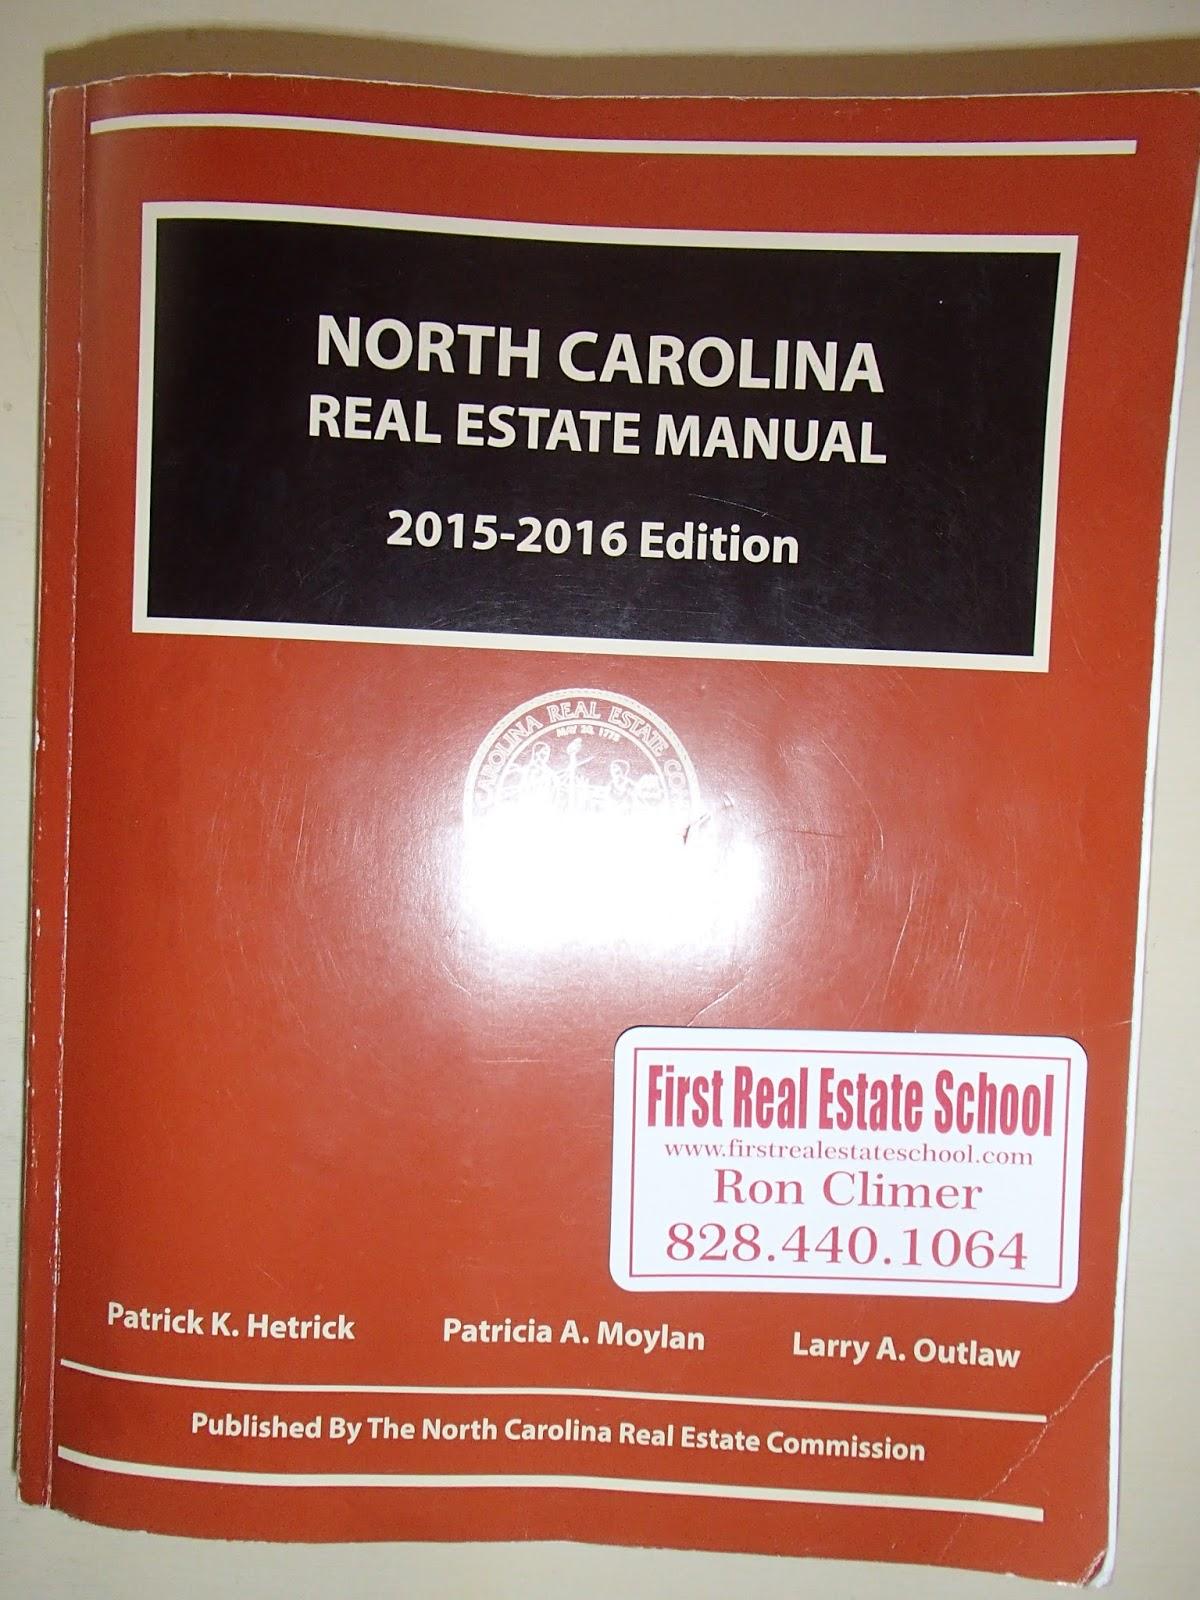 ron climer mountain messages free north carolina real estate manual rh rondclimer blogspot com north carolina real estate manual 2015-16 edition north carolina real estate manual